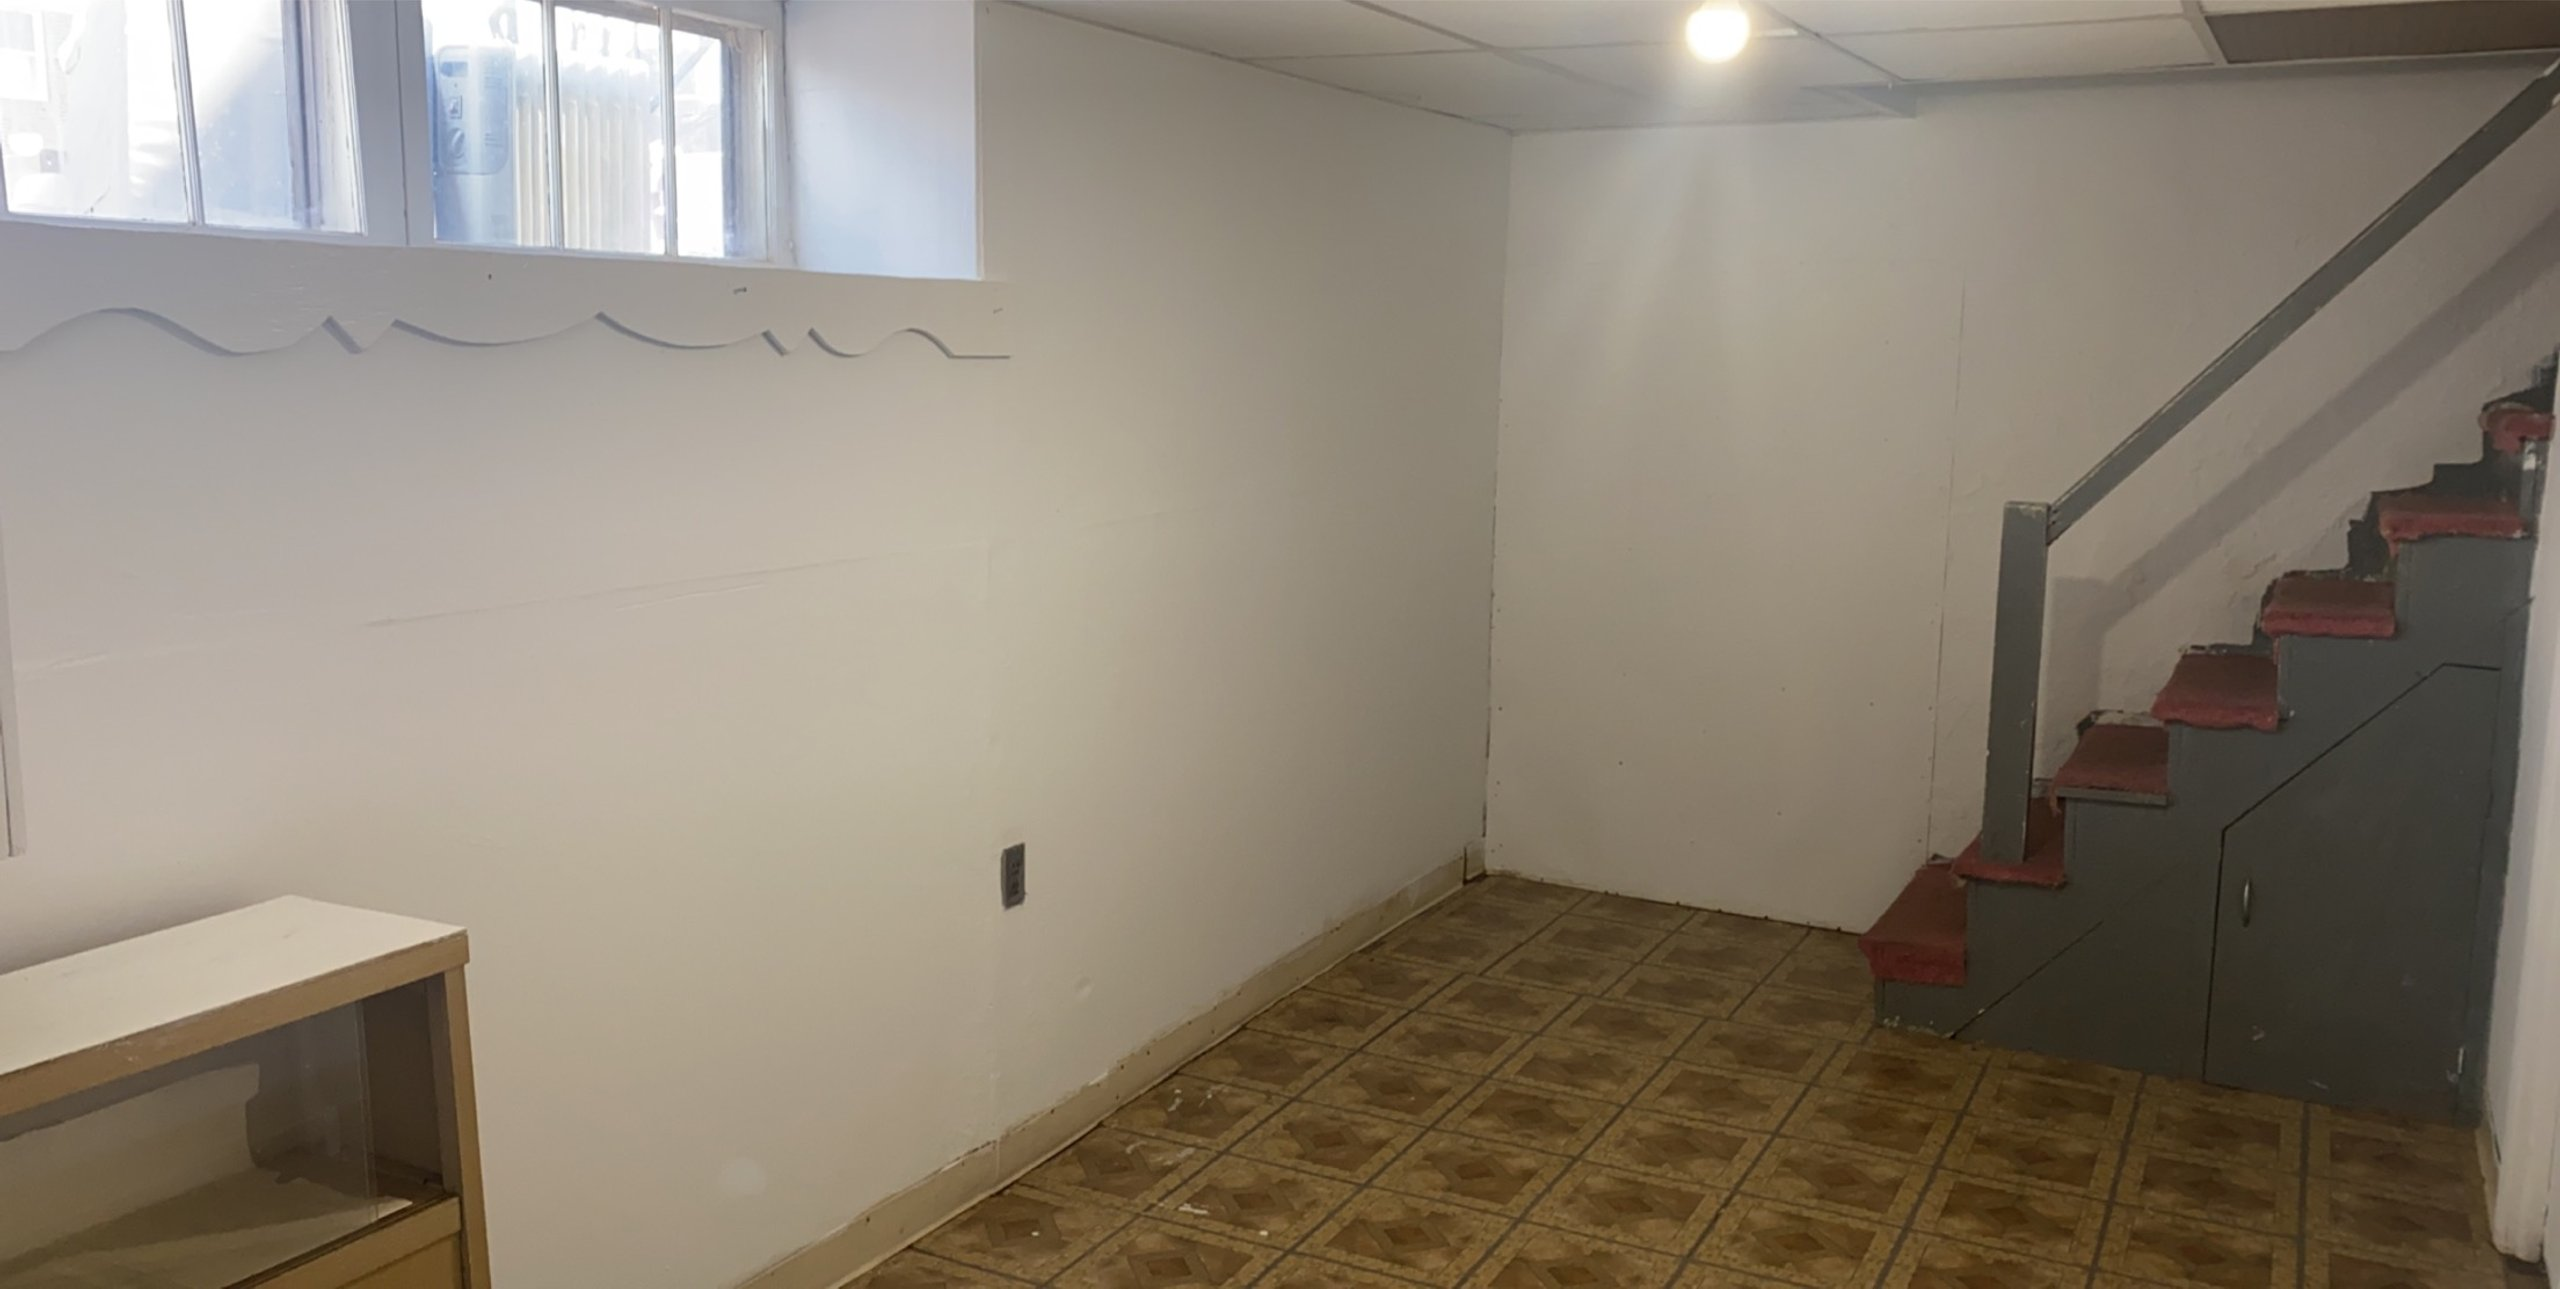 18x14 Basement self storage unit